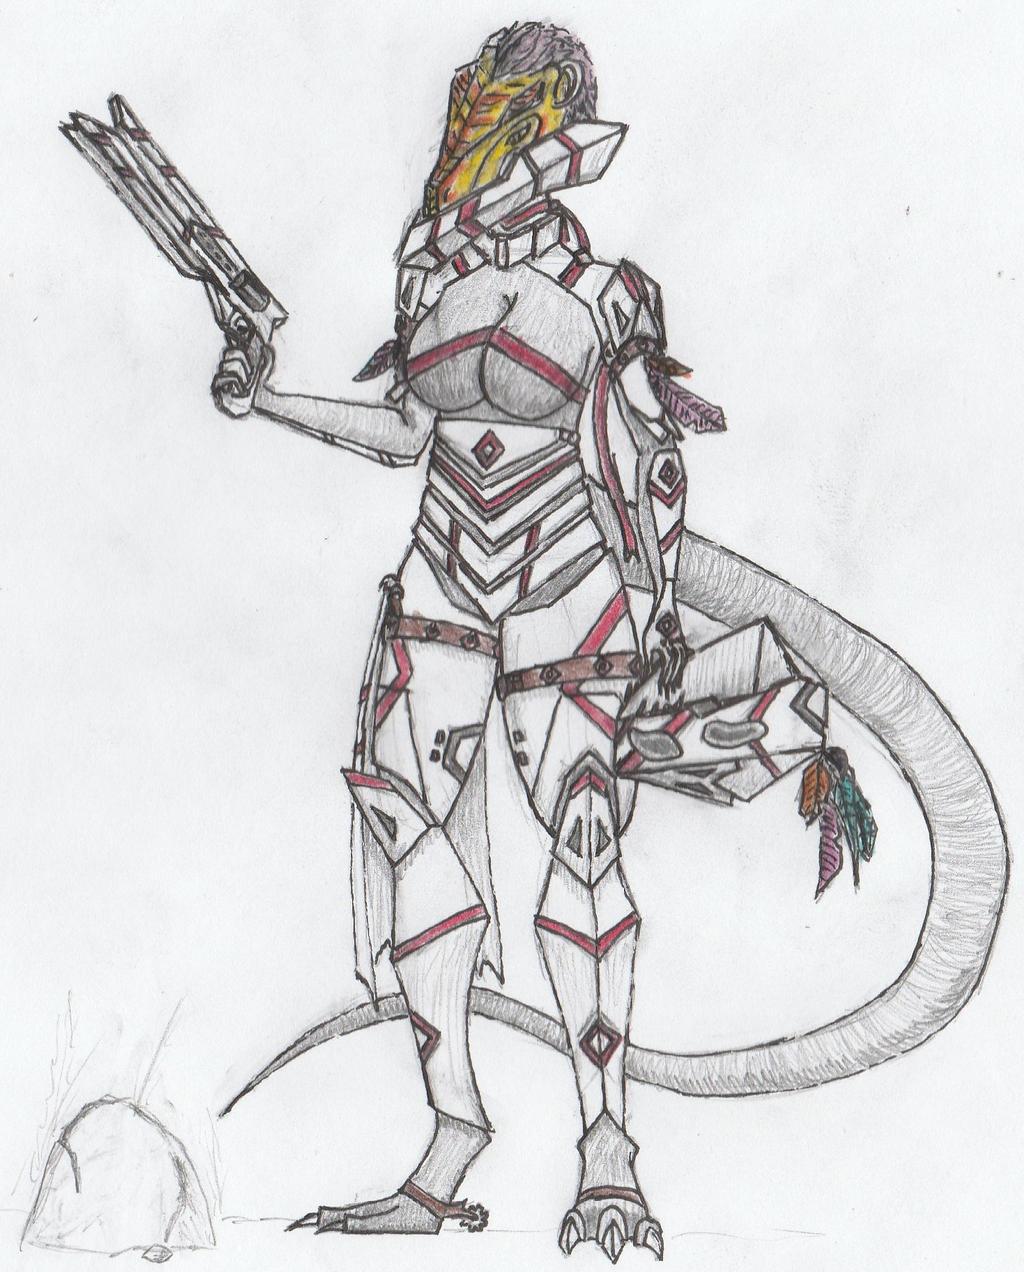 Cuetzpali Soldier III